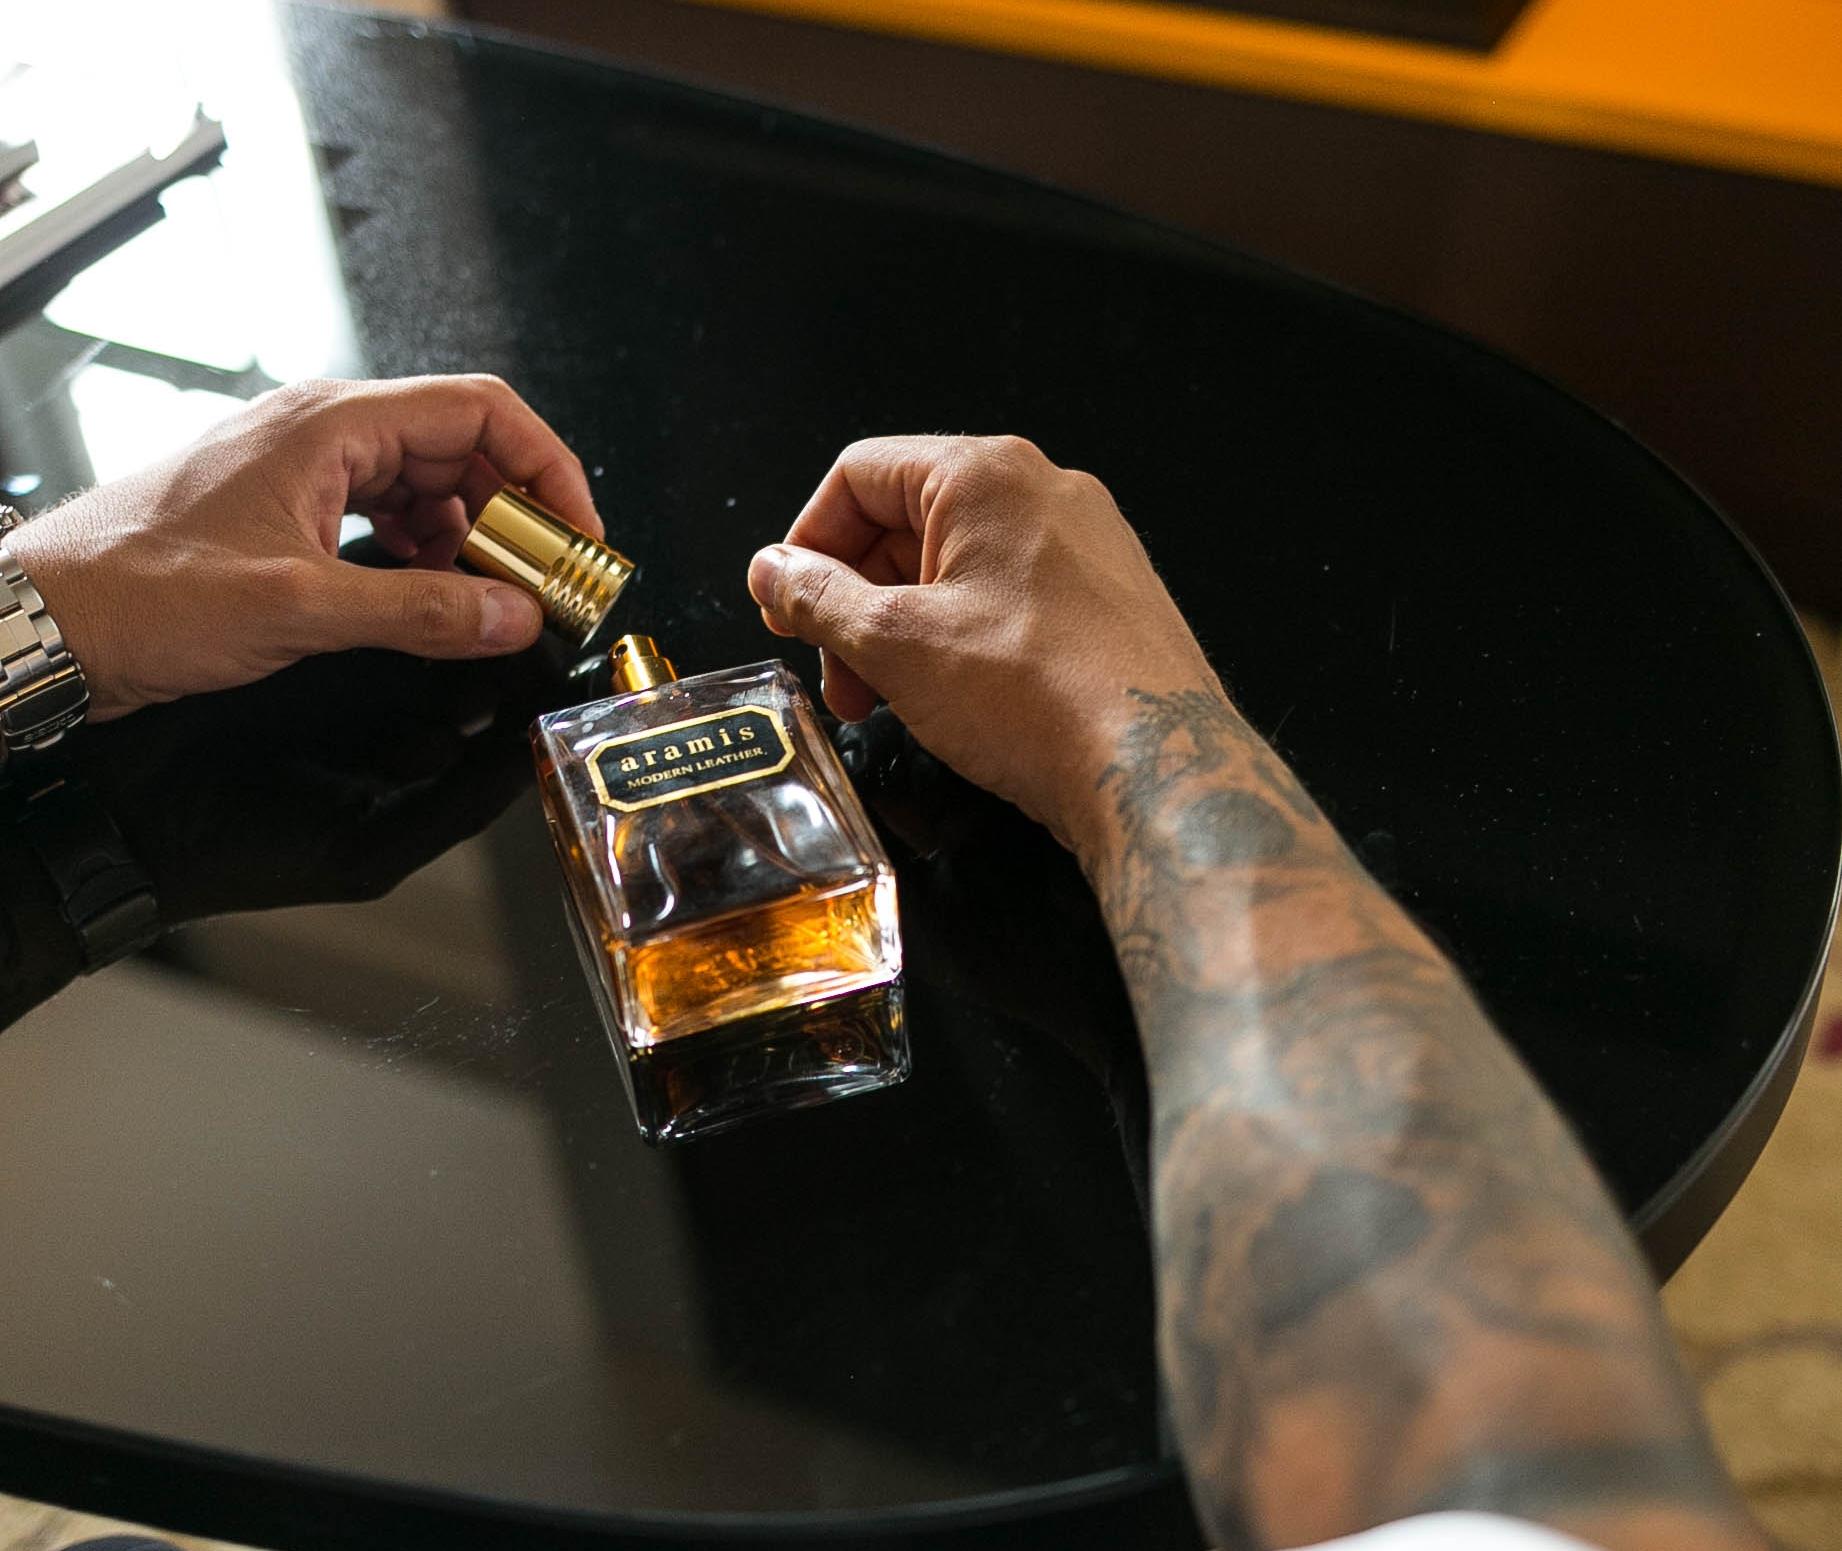 Aramis Modern Leather Fragrance.jpg